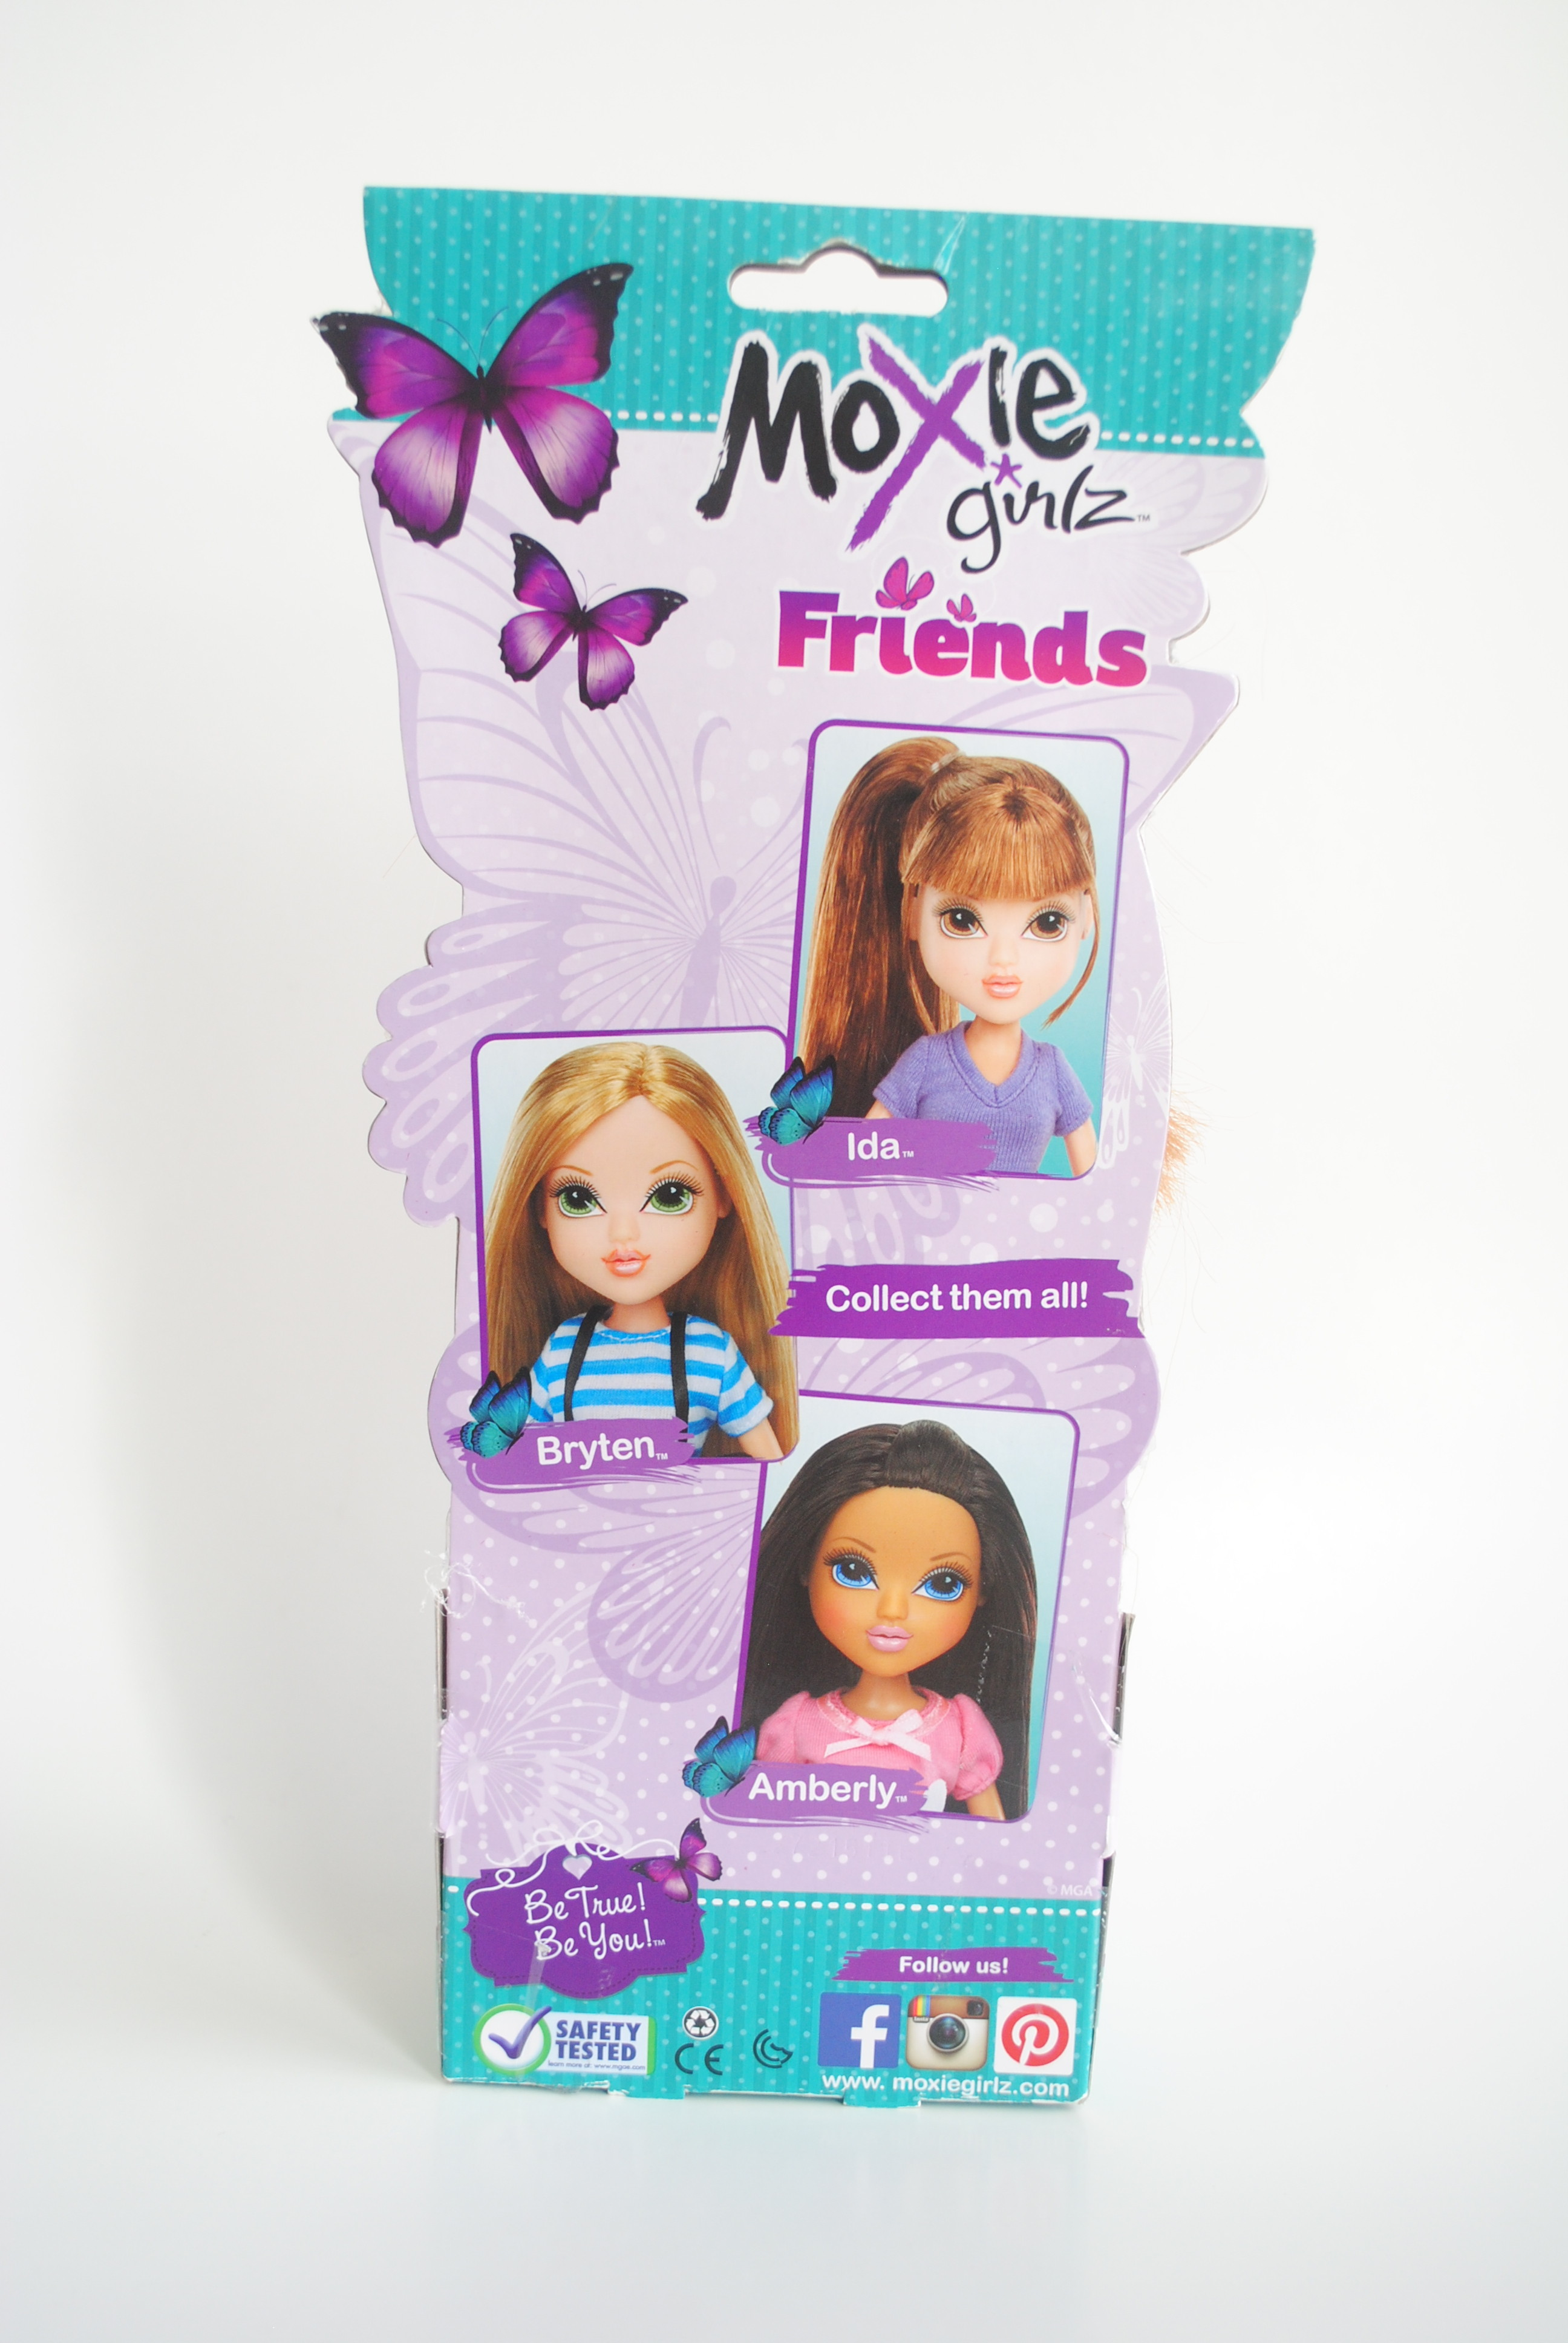 Review moxie girlz friends la mu eca m s barata dollicius - Moxie girlz pagine da colorare ...